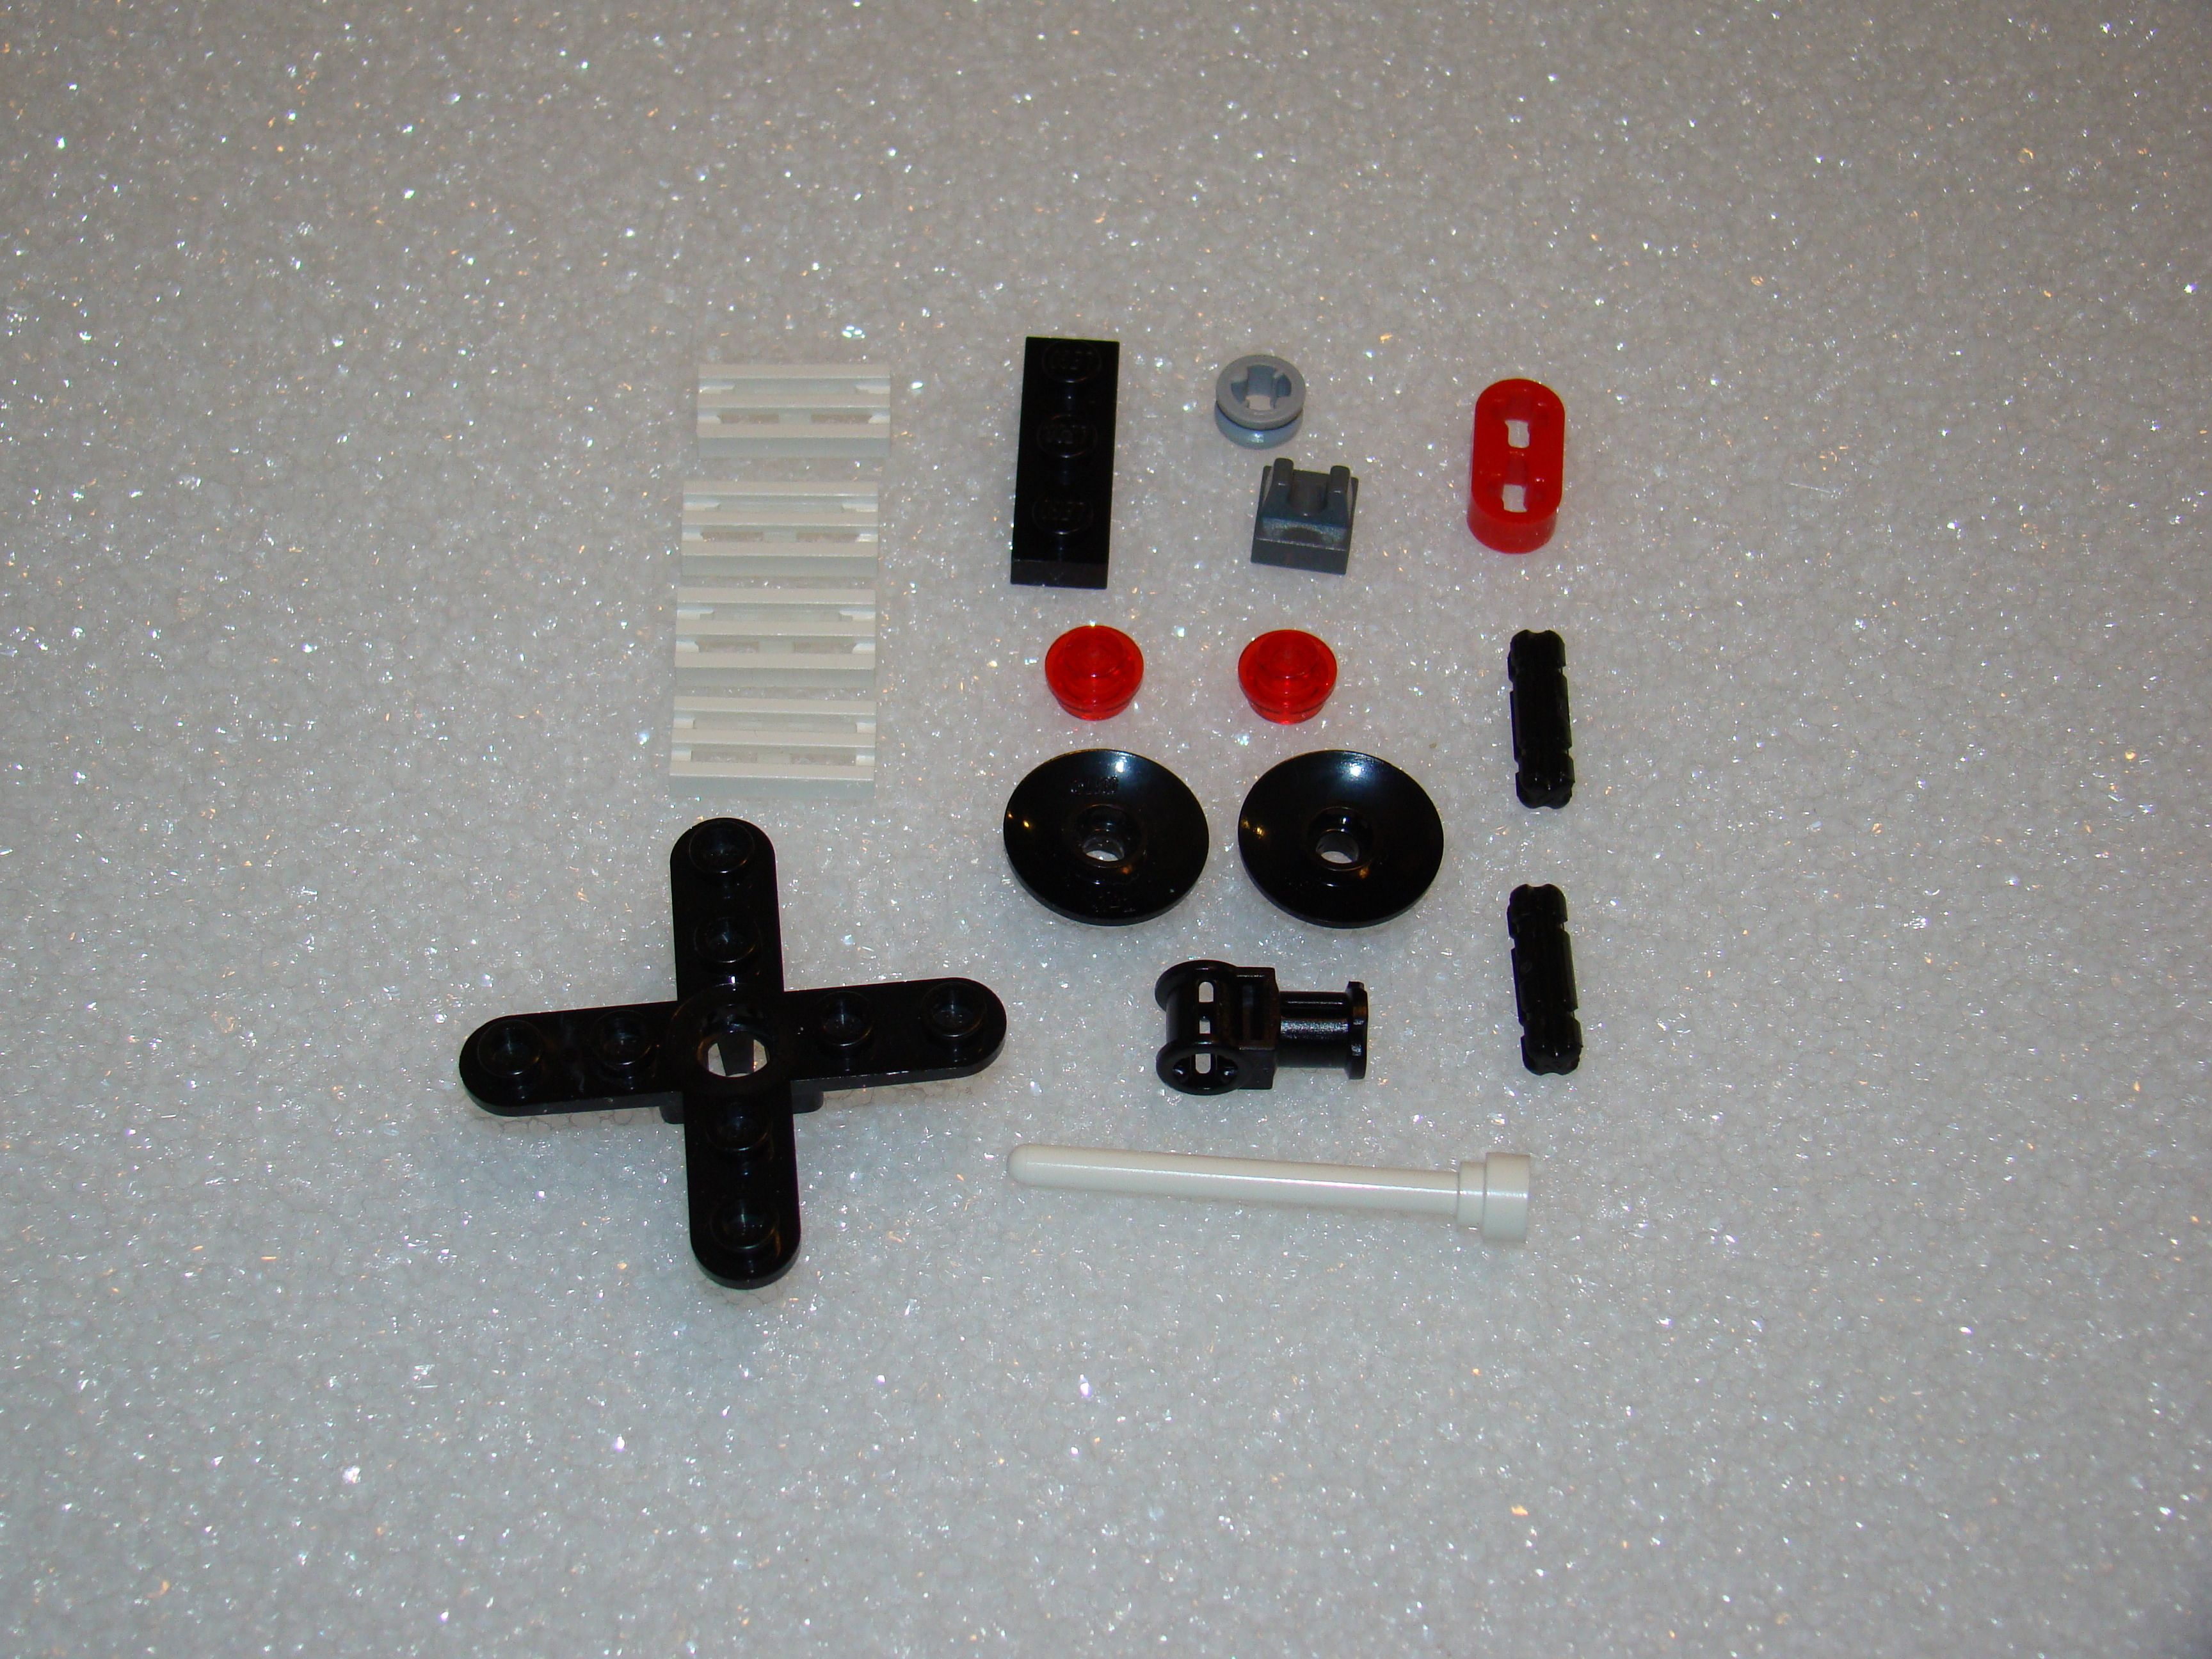 lego train signal - Google Search | Lego techniques | Pinterest ...